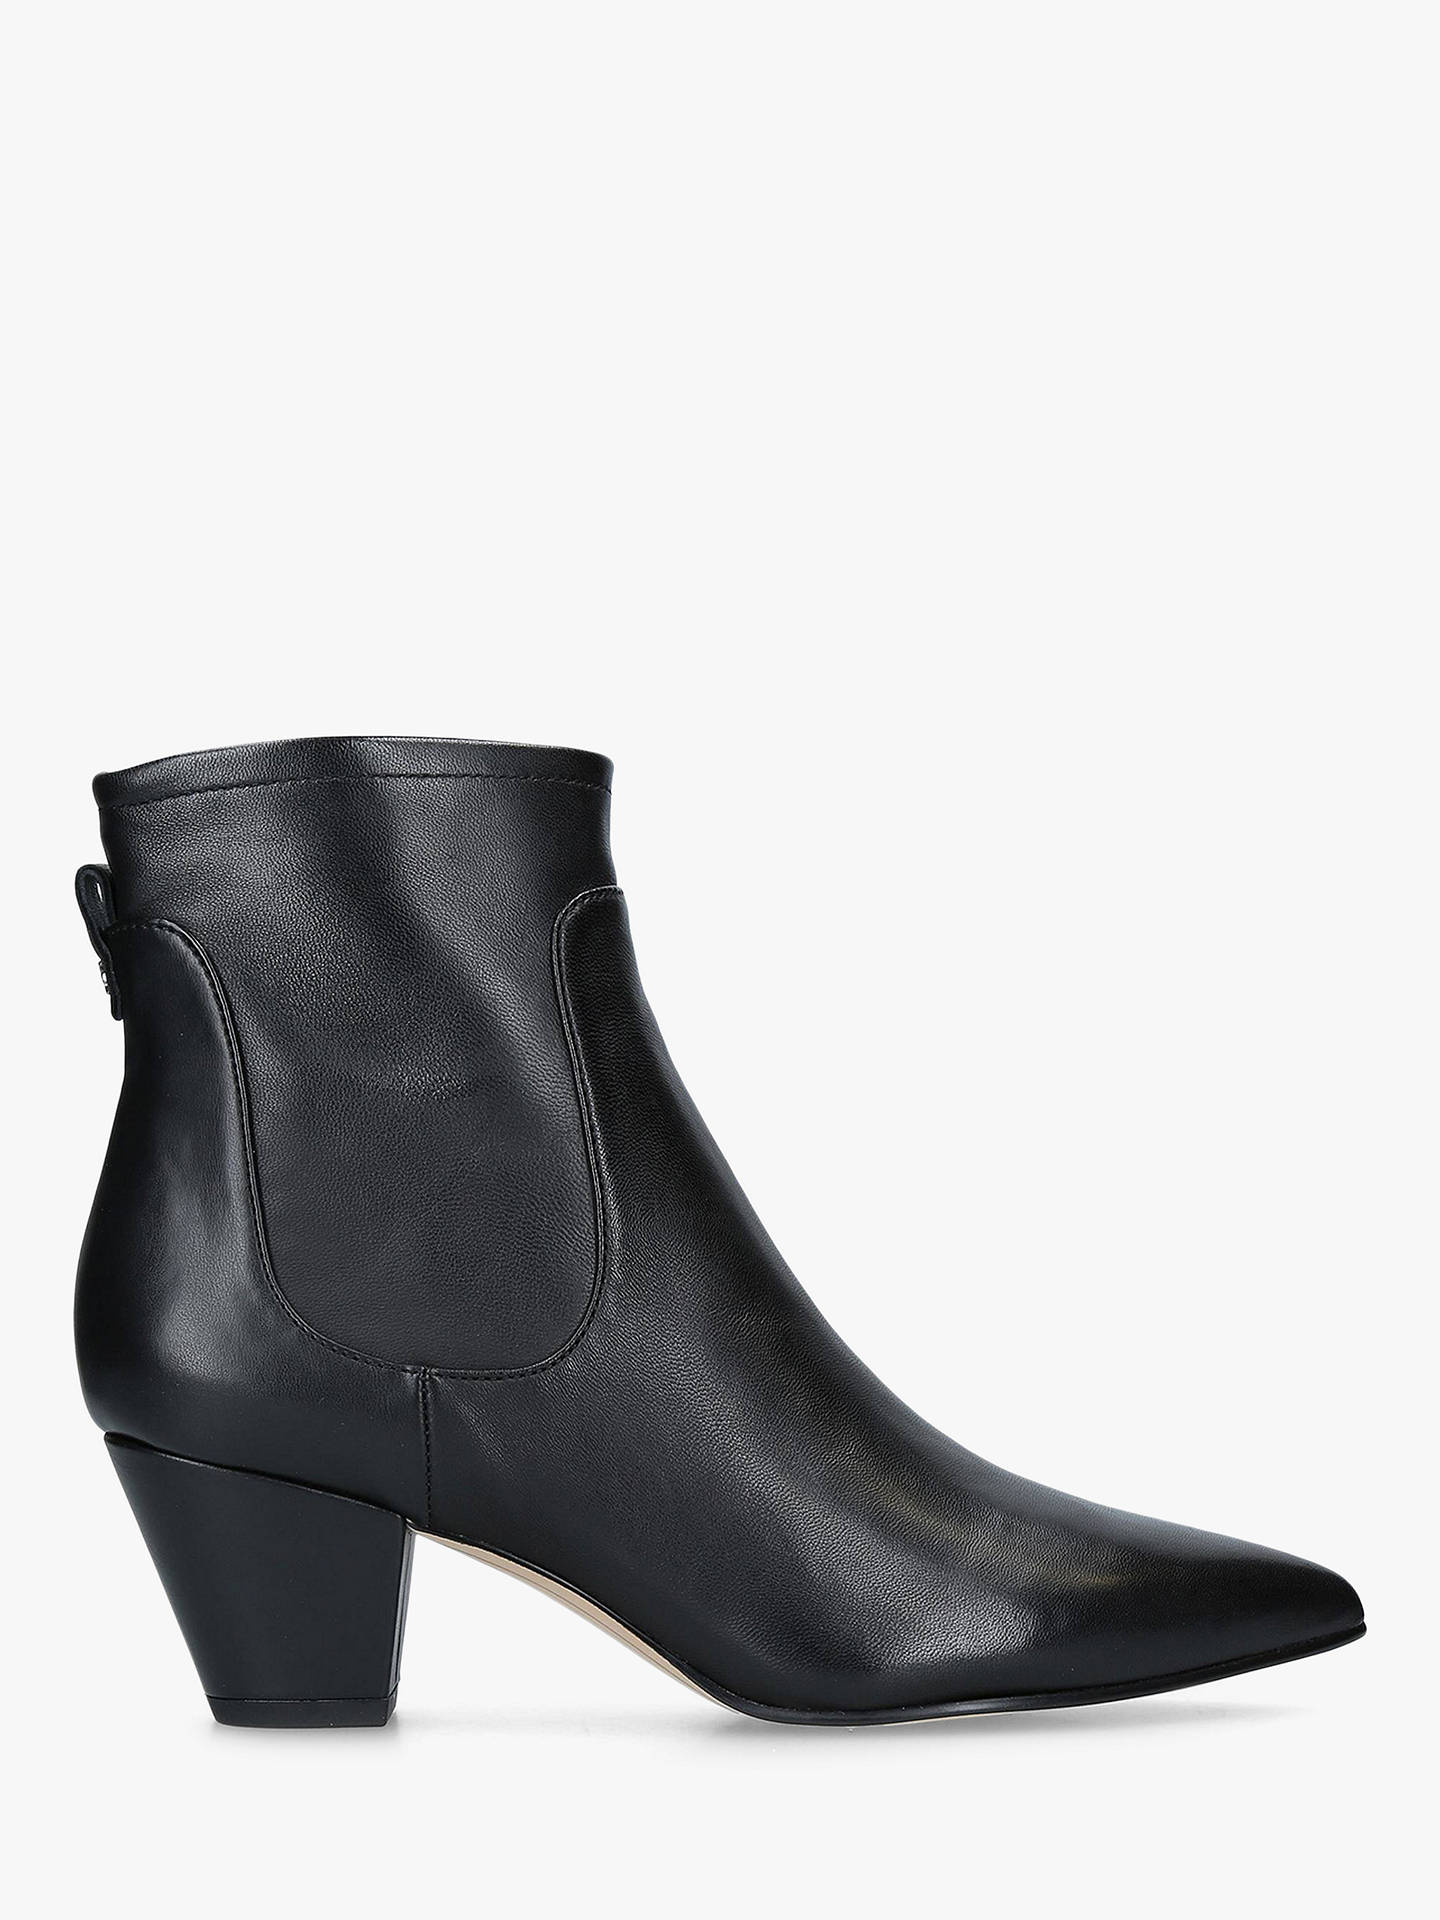 8ead68eb14e Buy Sam Edelman Karlee Ankle Boots